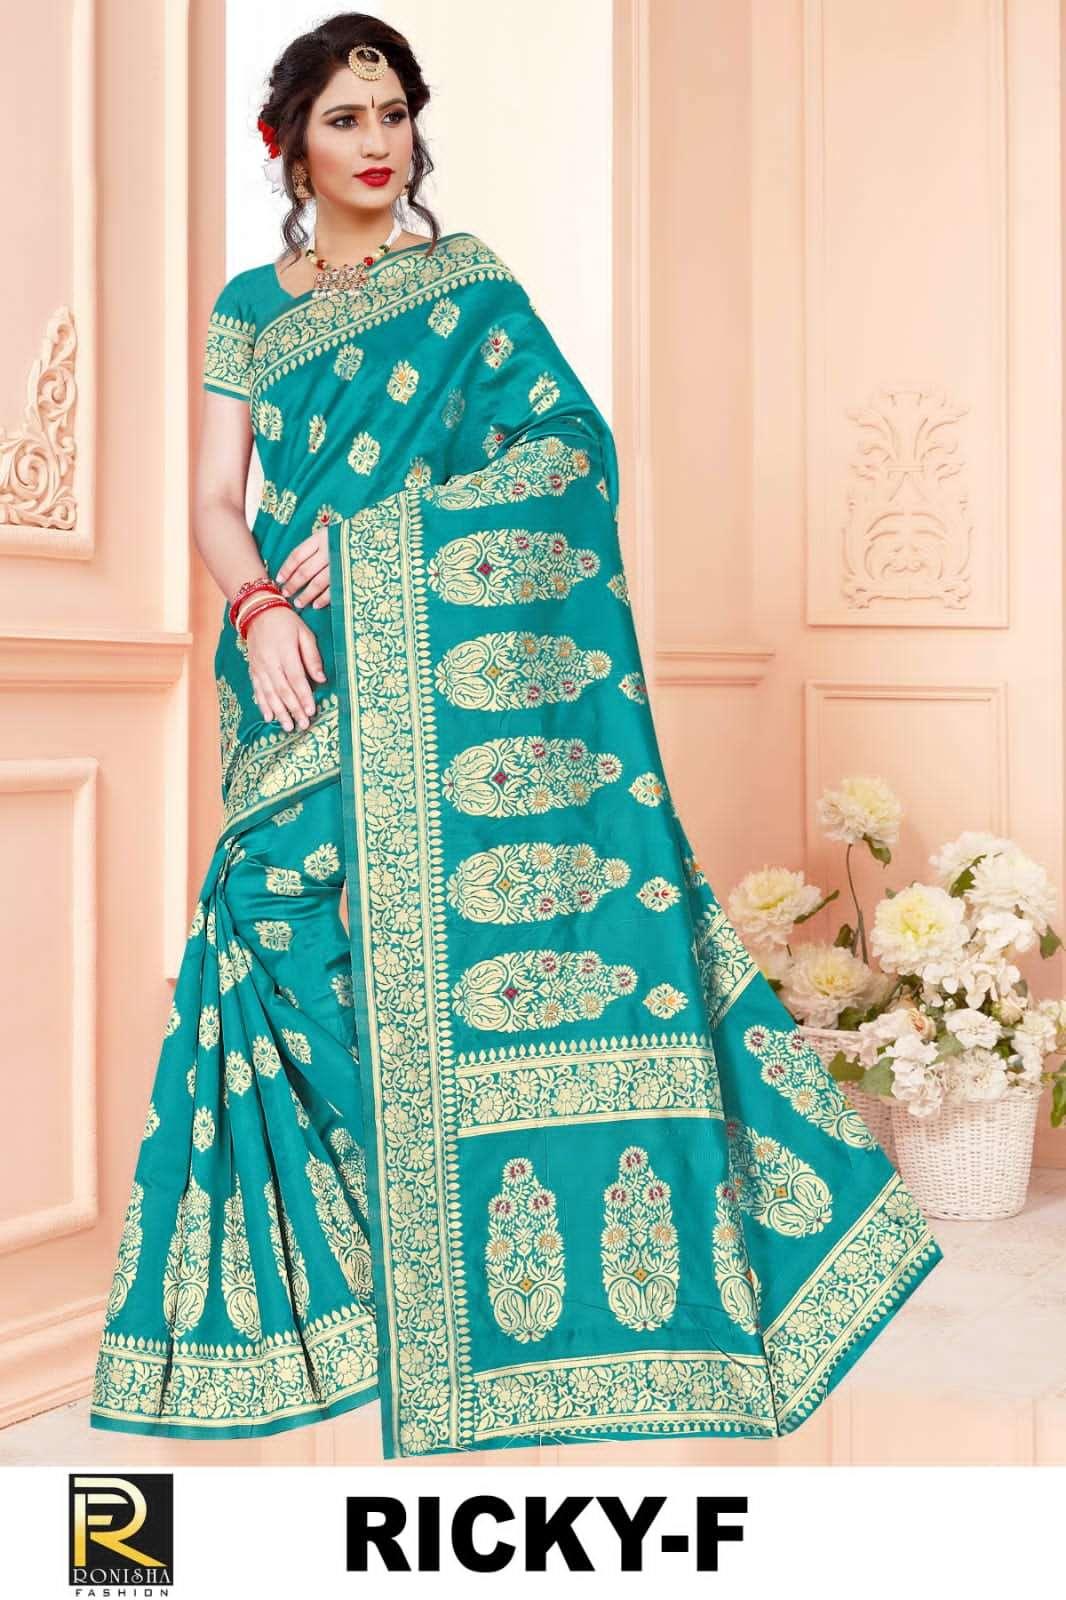 Ricky by ranjna saree ethnik wear silk saree collction wholesale shop